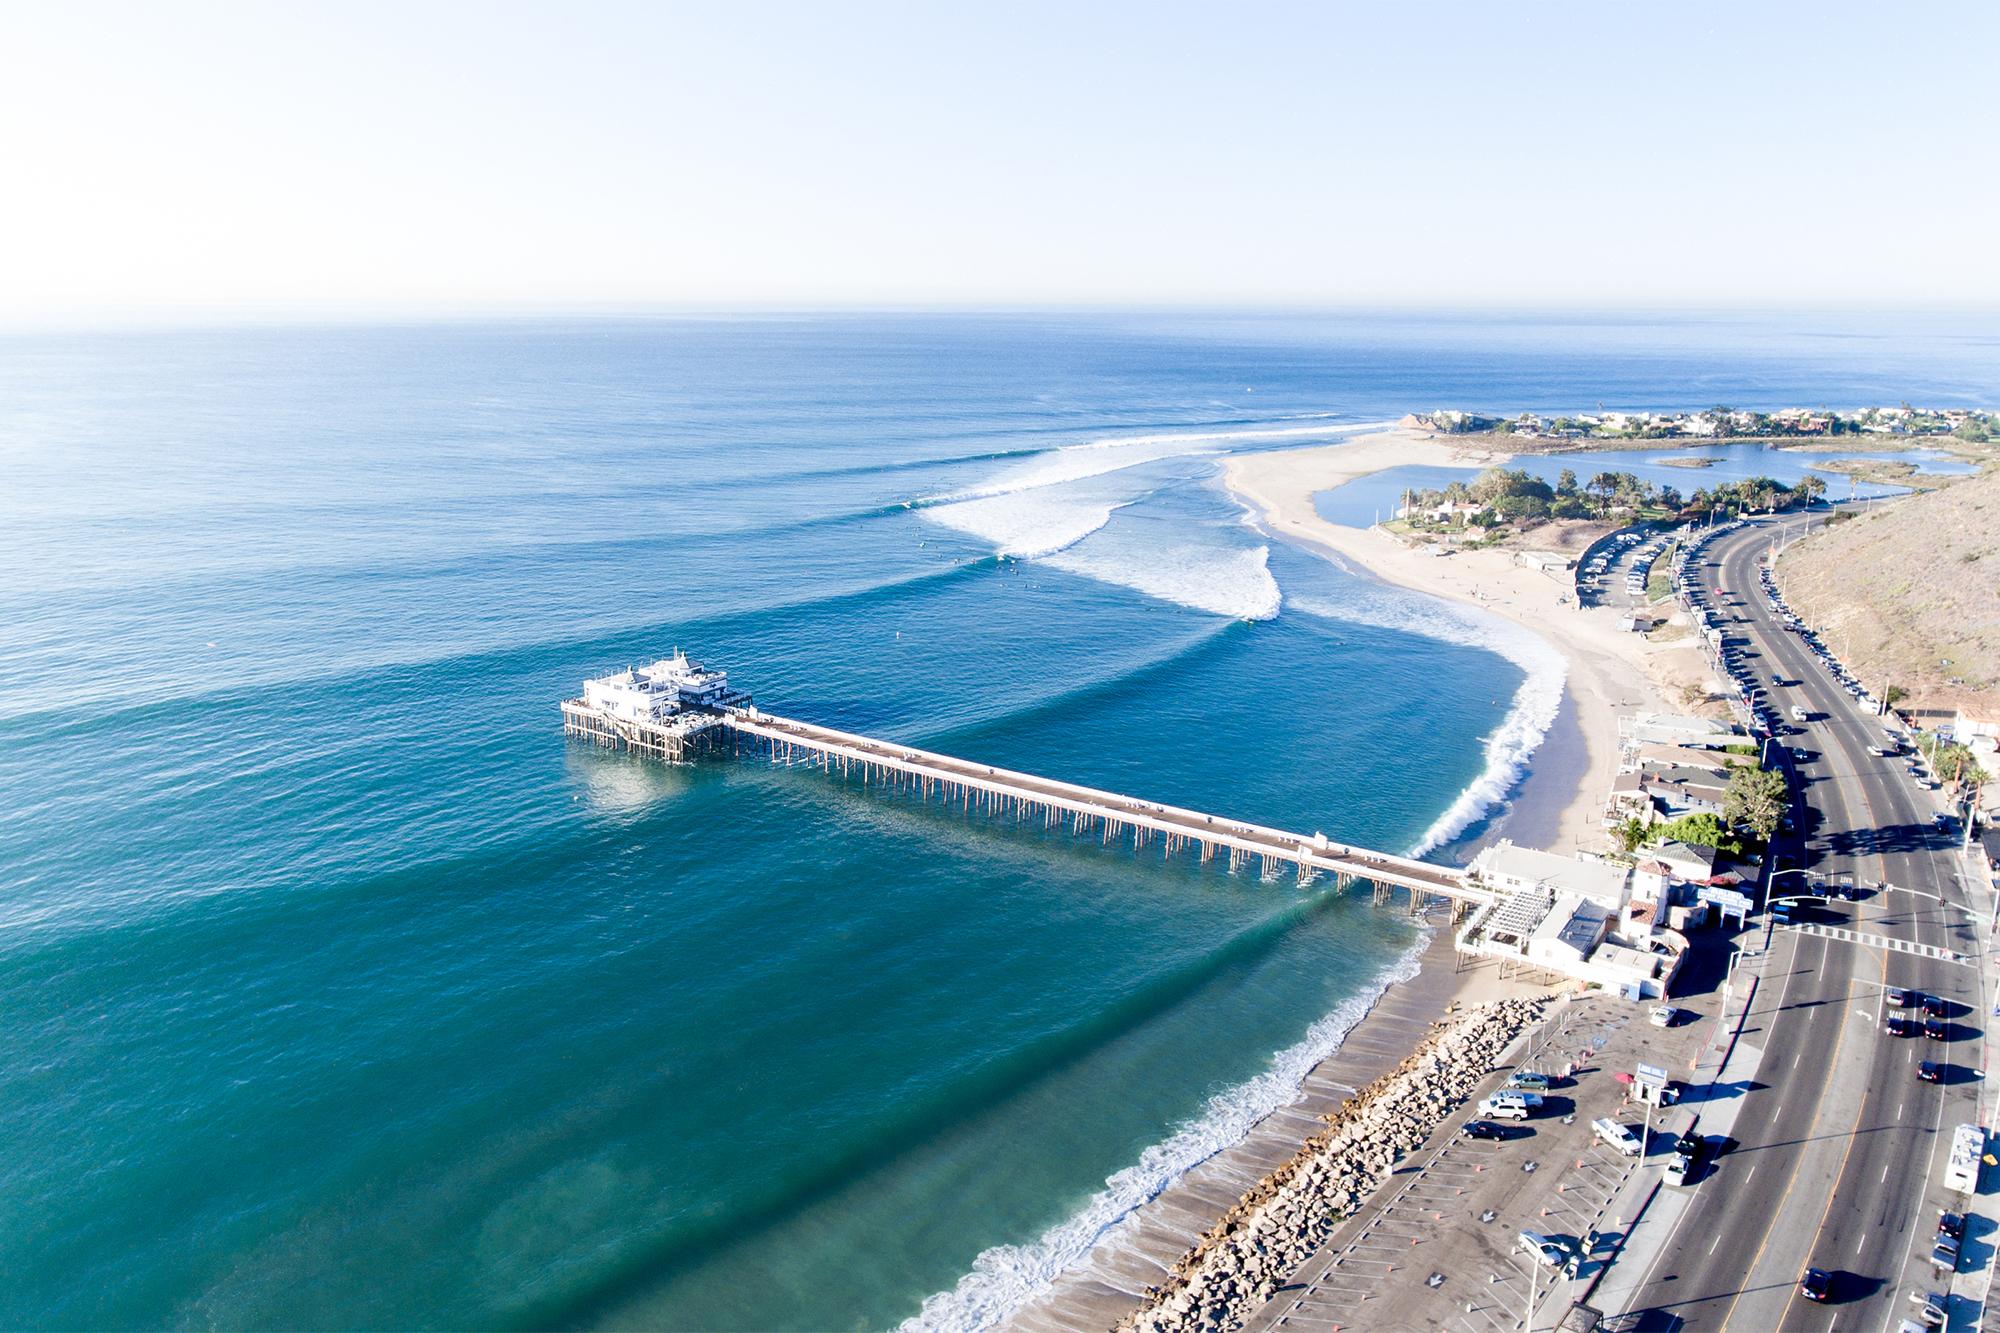 Malibu Point Surfing California